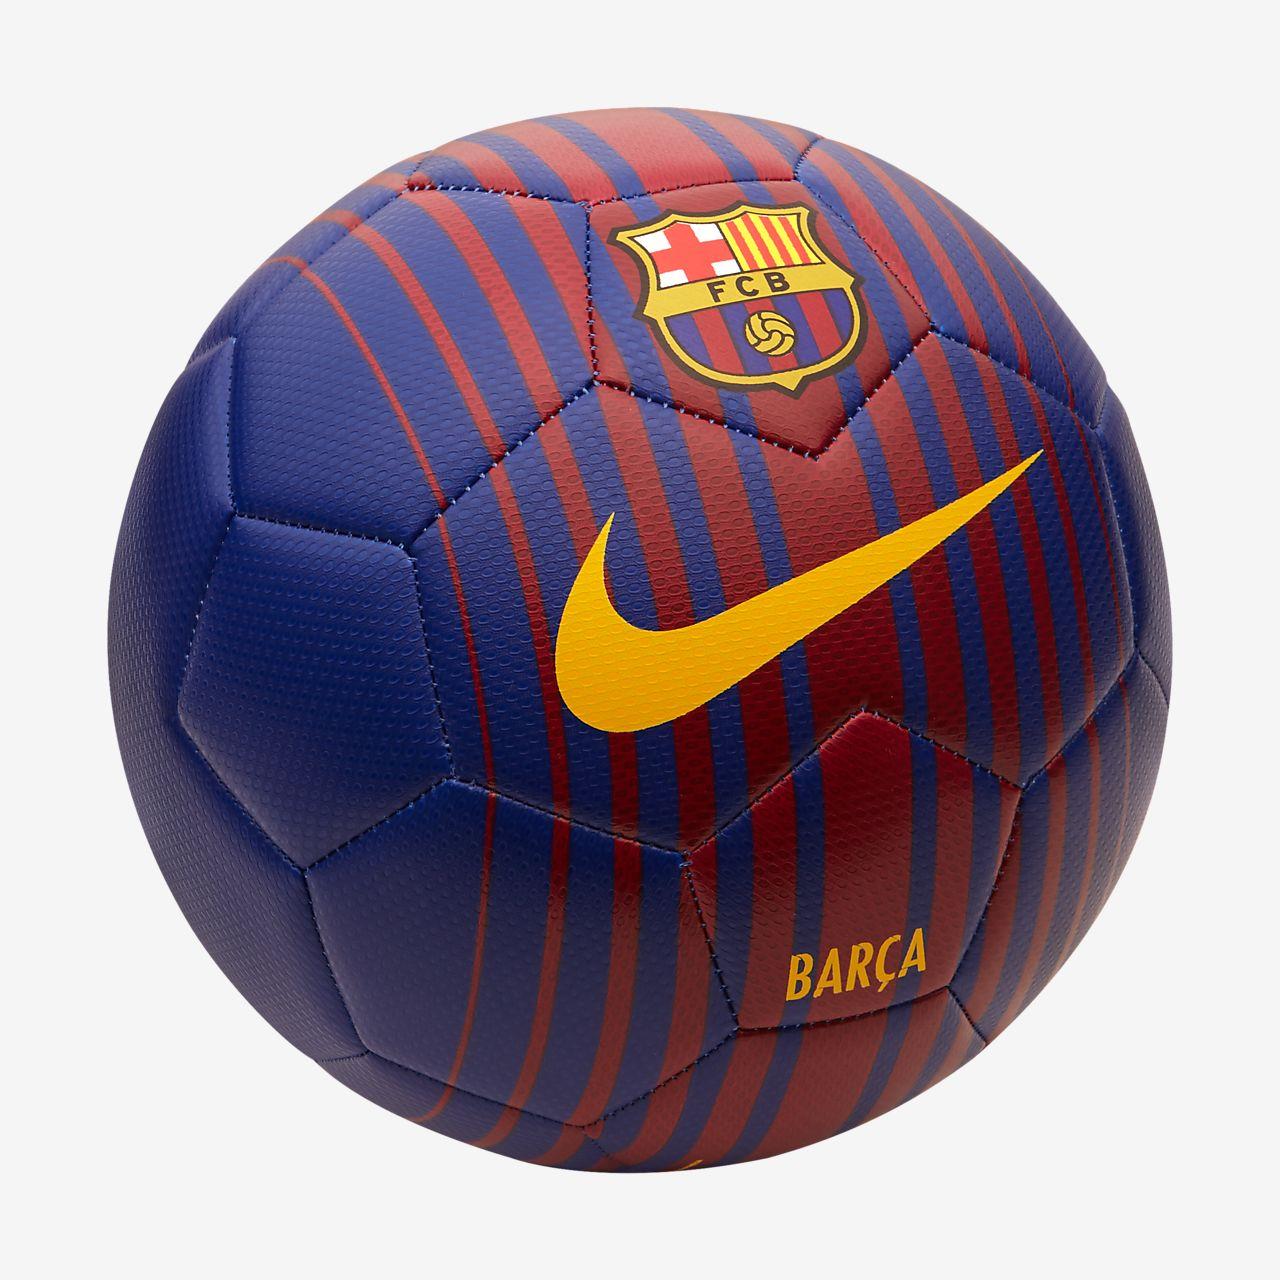 Balón de fútbol FC Barcelona Prestige. Nike.com CL ce6759ffafe84